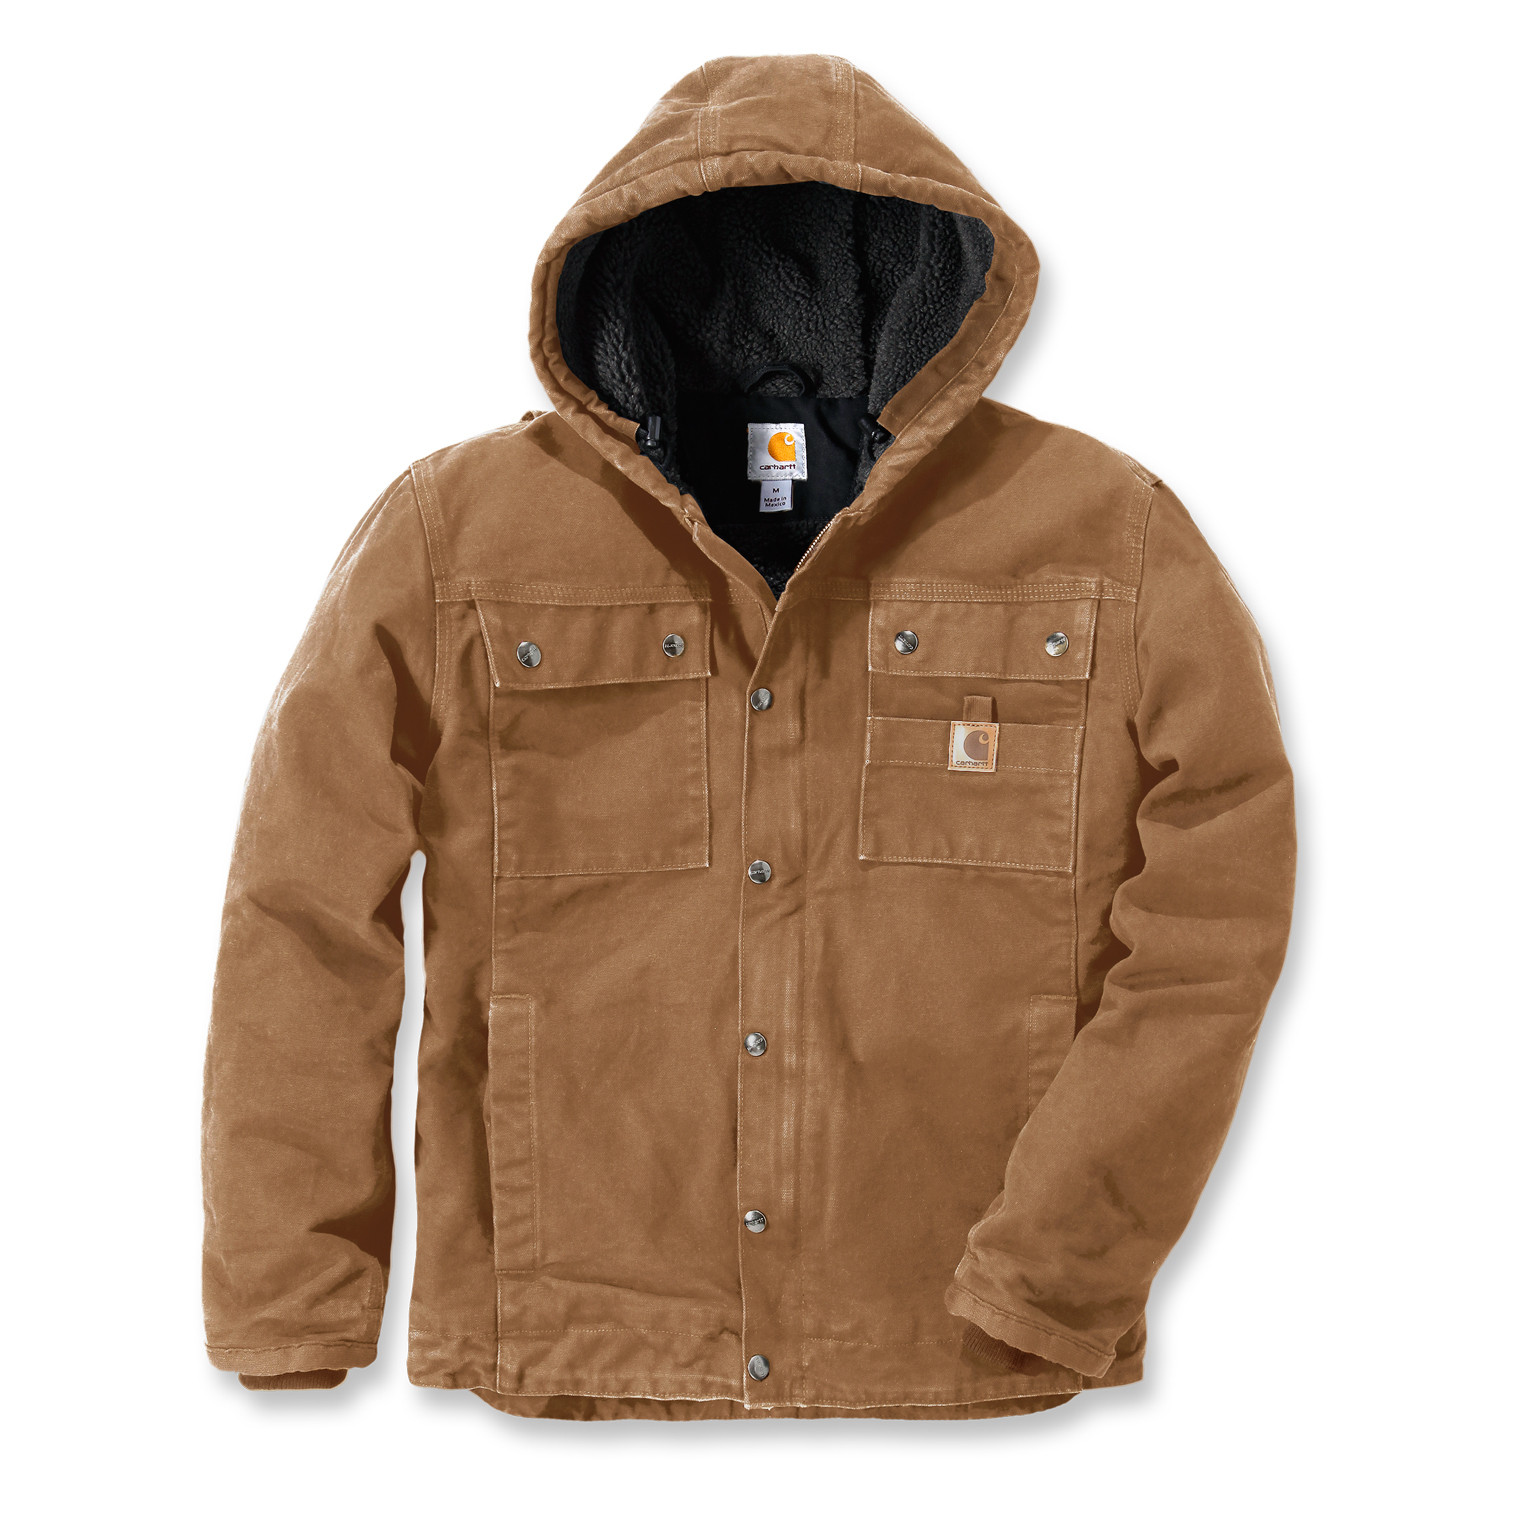 Куртка котоновая Carhartt Sandstone Barlett Jacket - 102285 (Carhartt Brown, M)